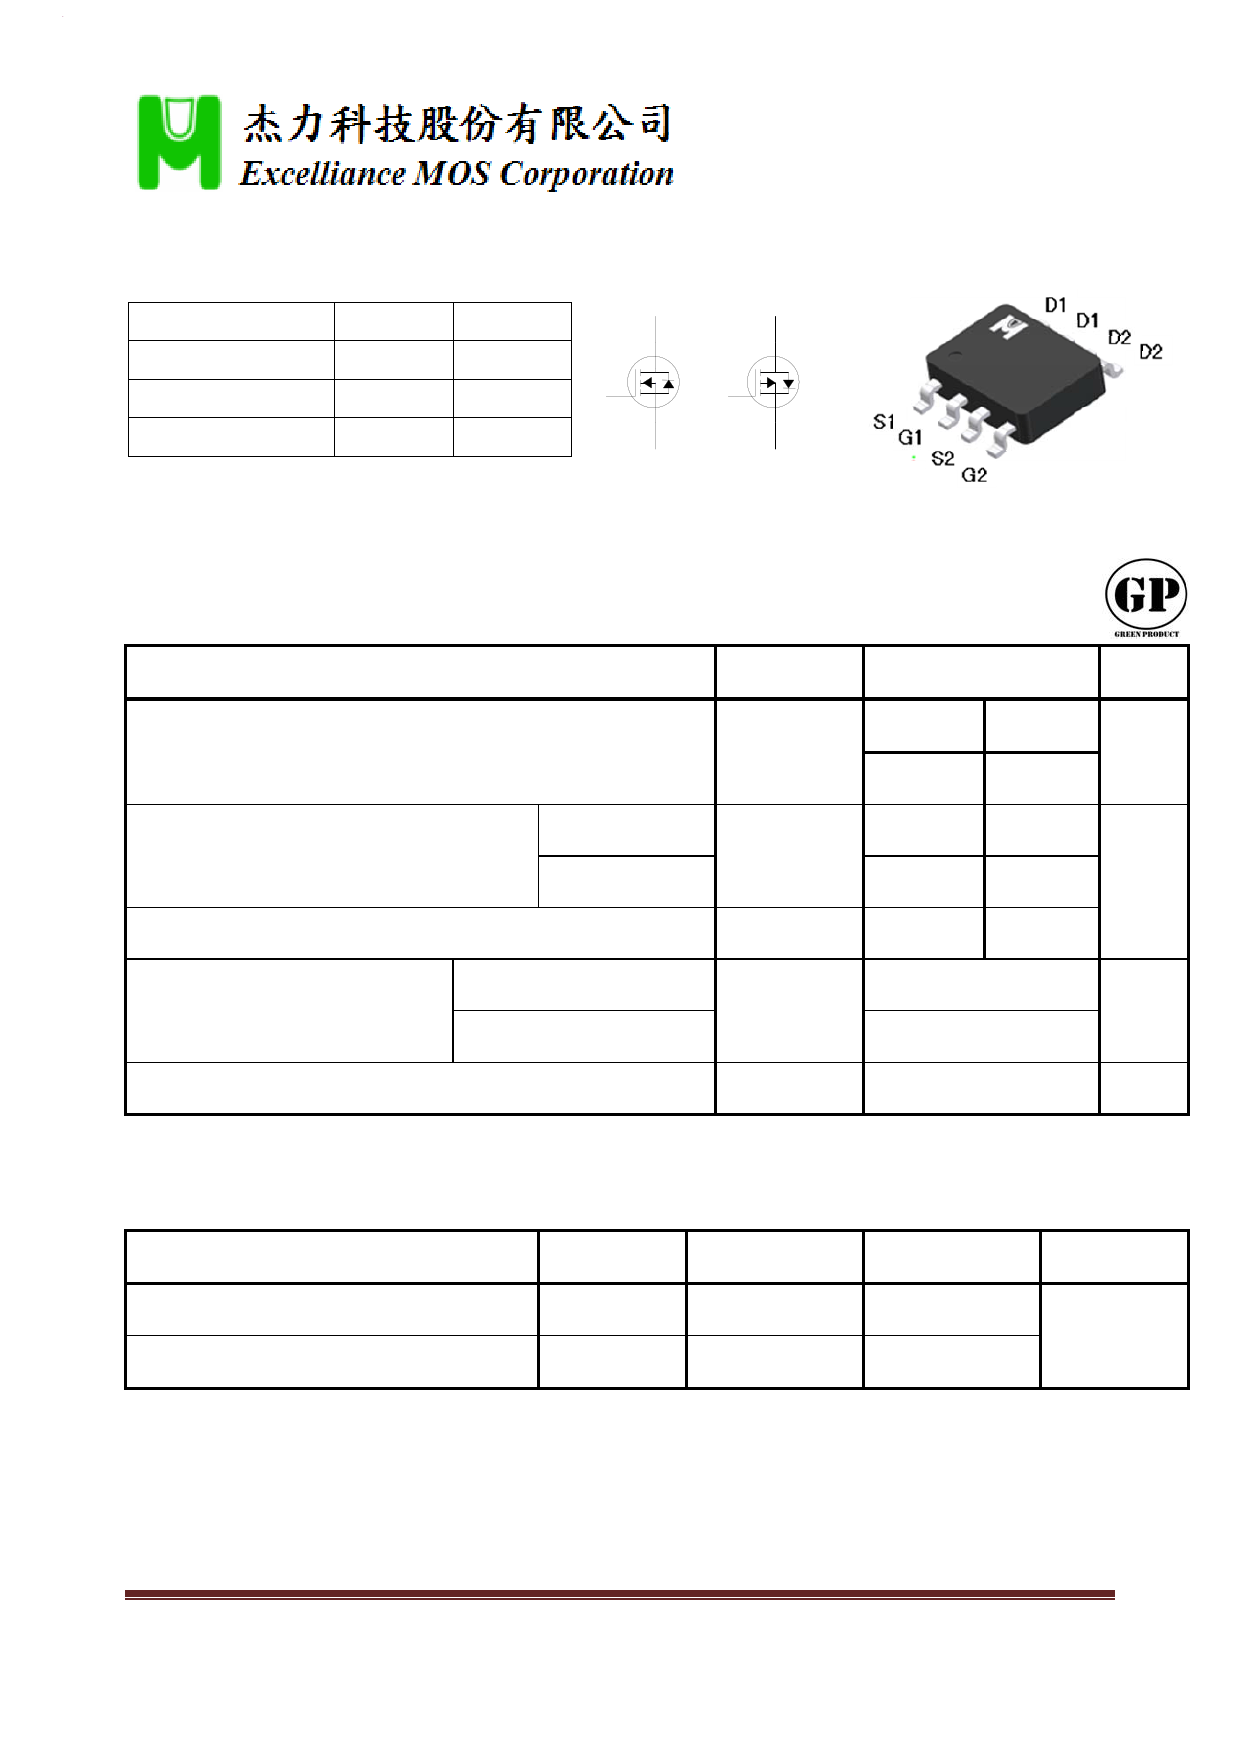 EMB28C04G دیتاشیت PDF